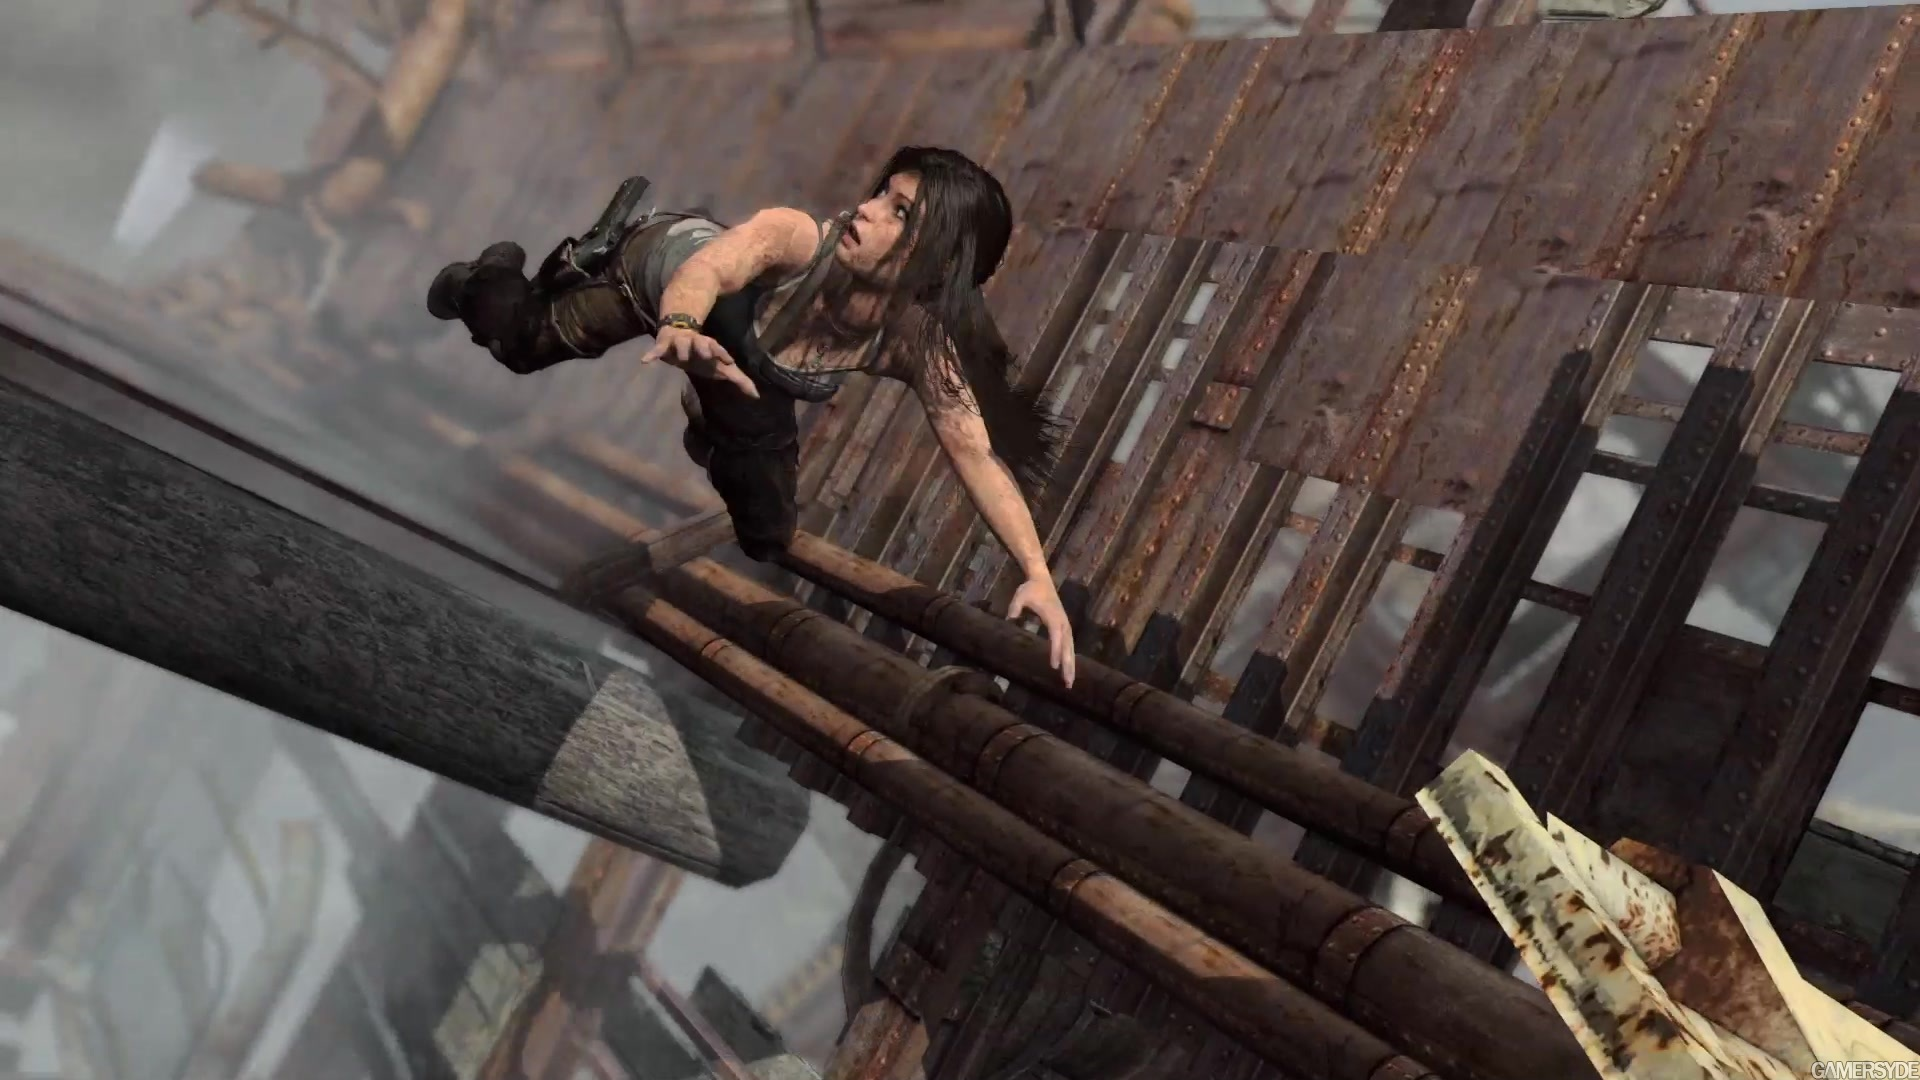 image tomb raider 24052 1912 0021 تصاویر جدیدی از عنوان Tomb Raider: Definitive Edition منتشر شد